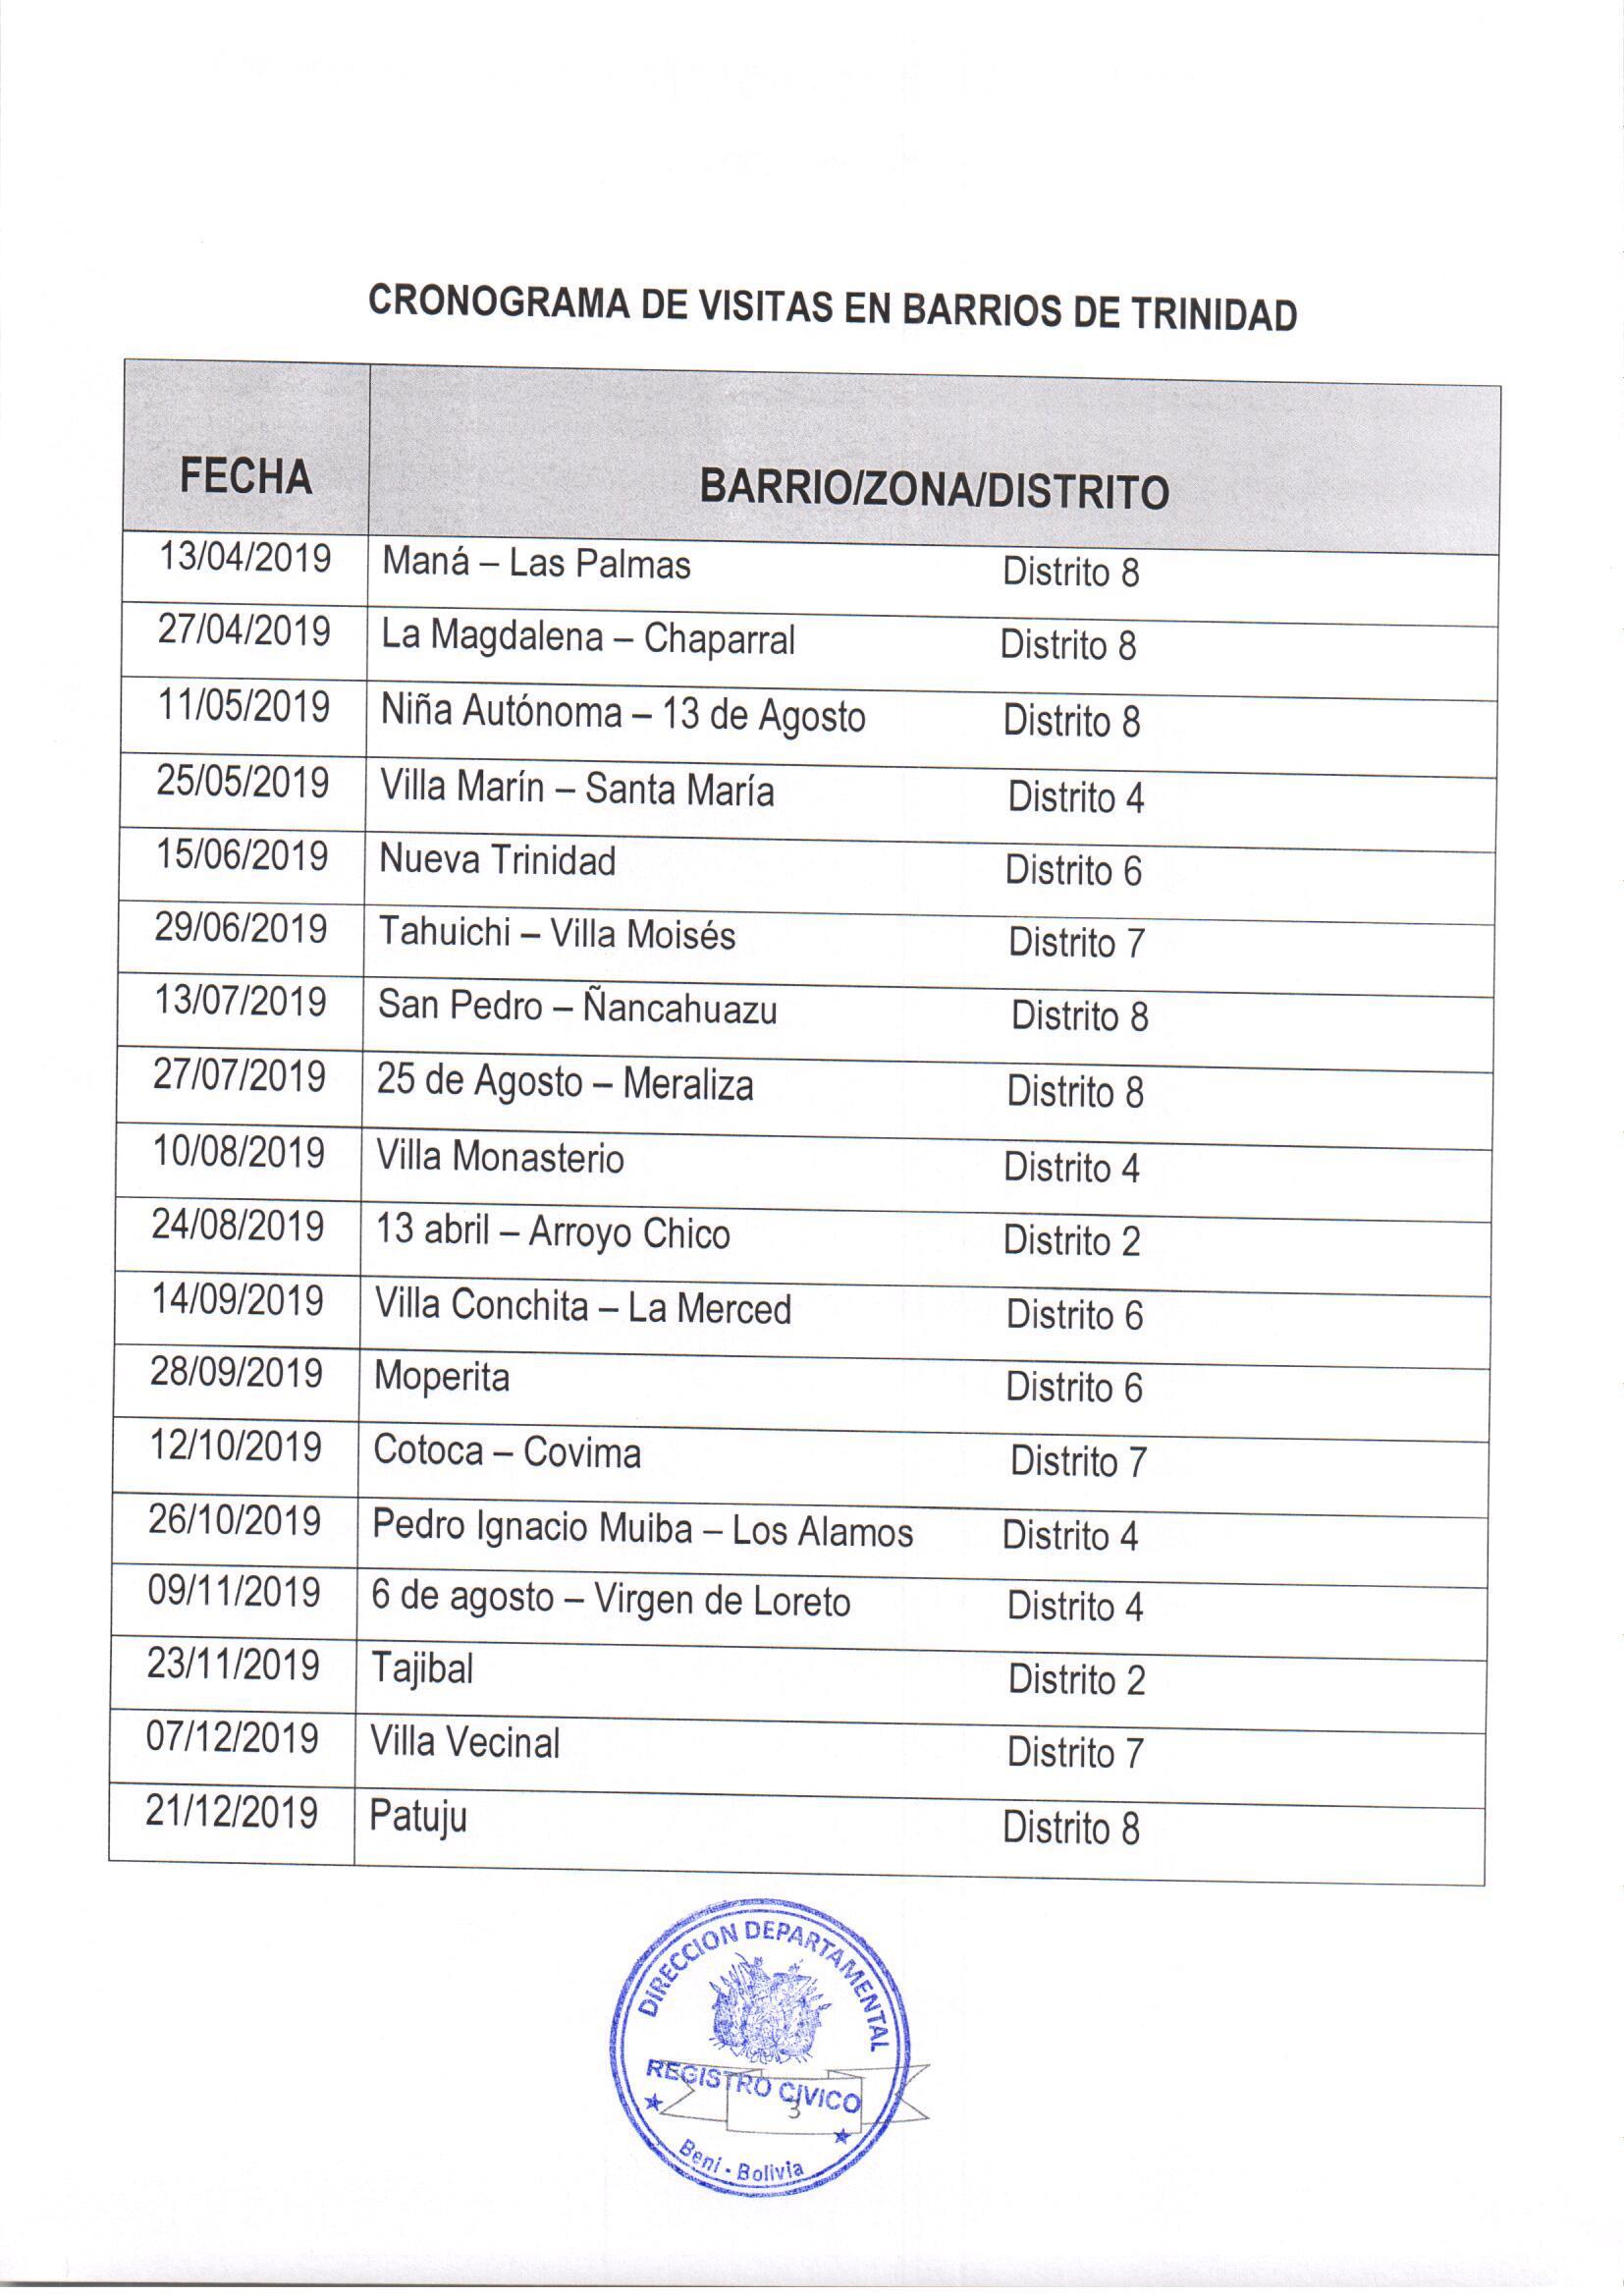 cronograma_serecientubarrio_beni_040419